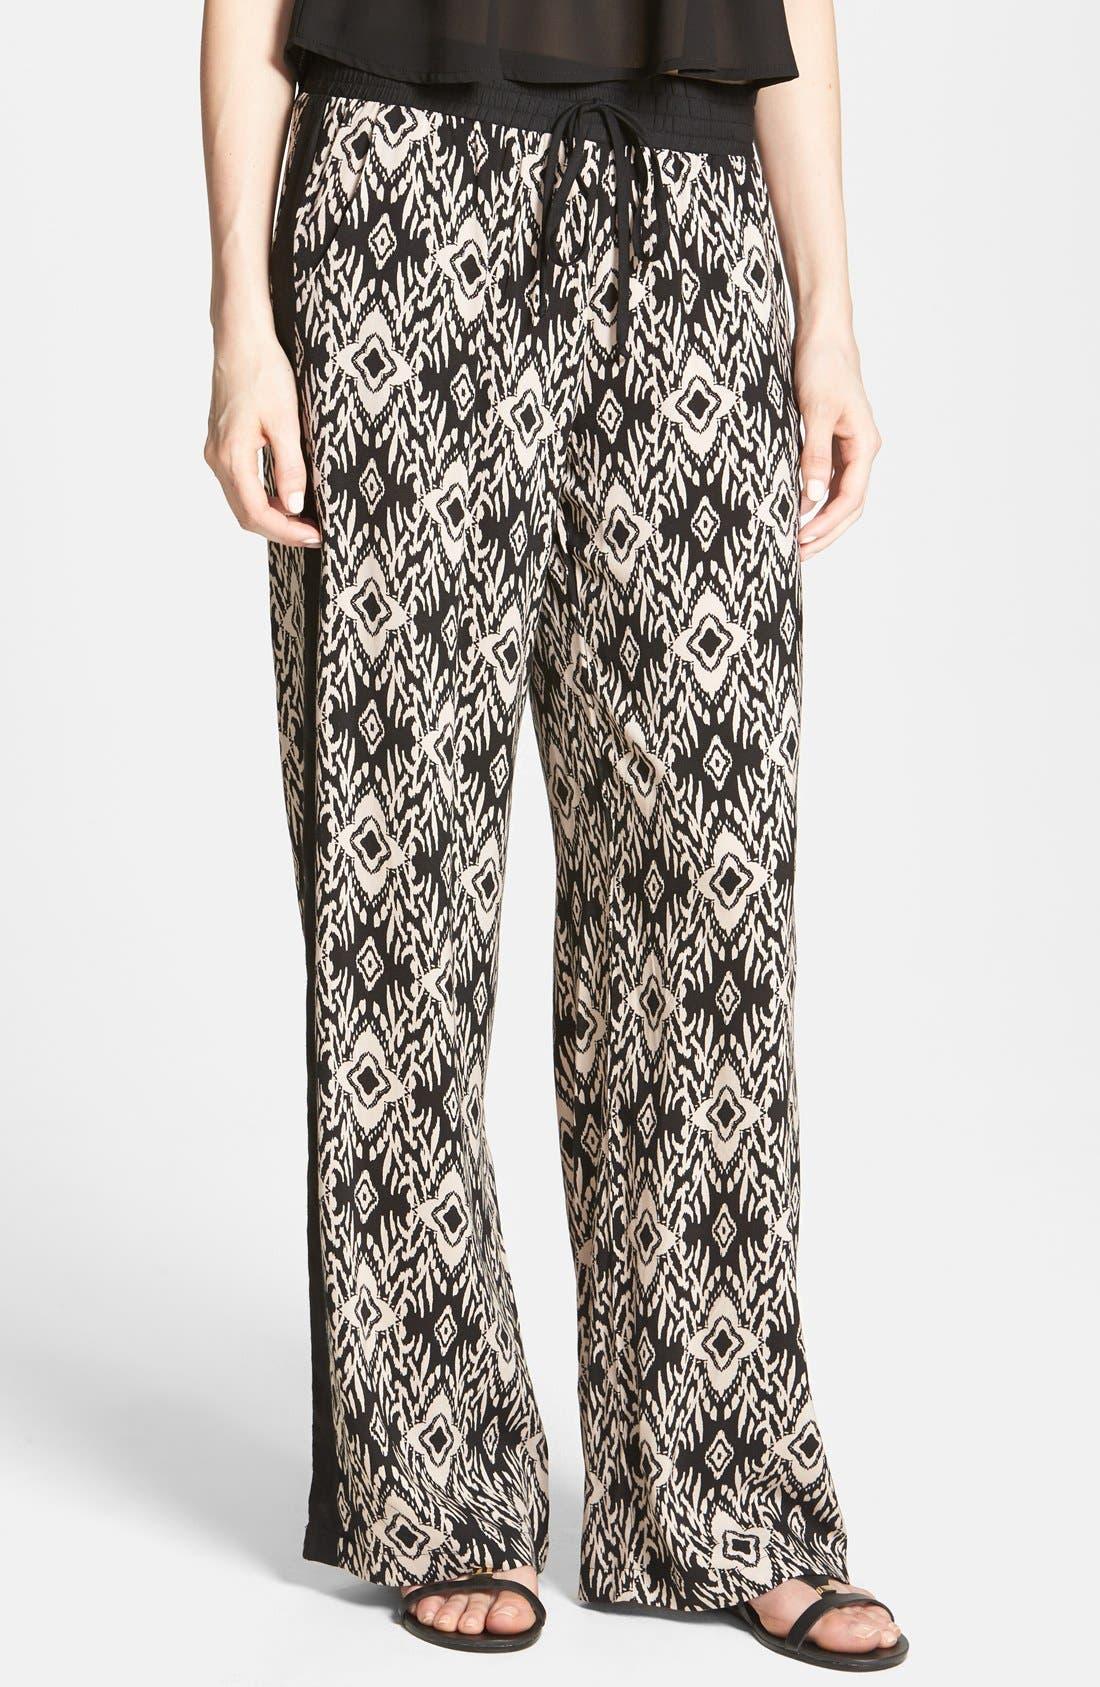 Alternate Image 1 Selected - Socialite Tux Stripe Palazzo Pants (Juniors)